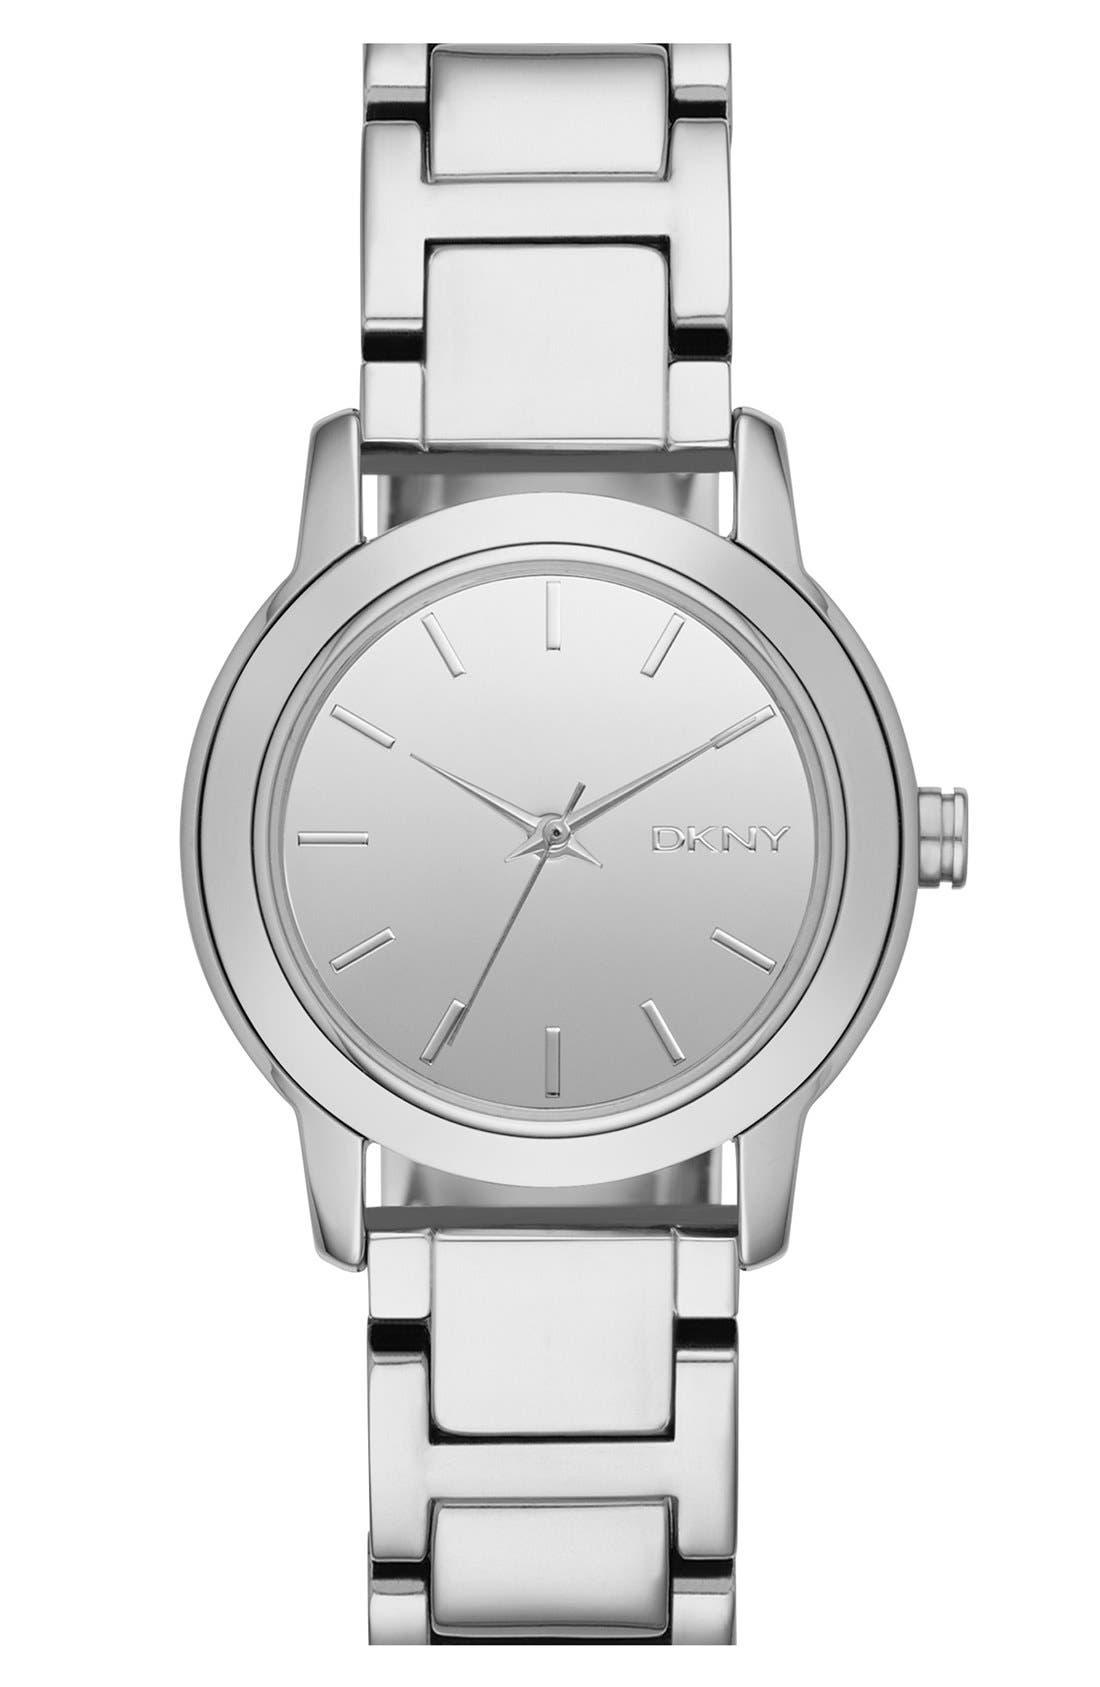 Main Image - DKNY 'Tompkins' Mirror Finish Bracelet Watch